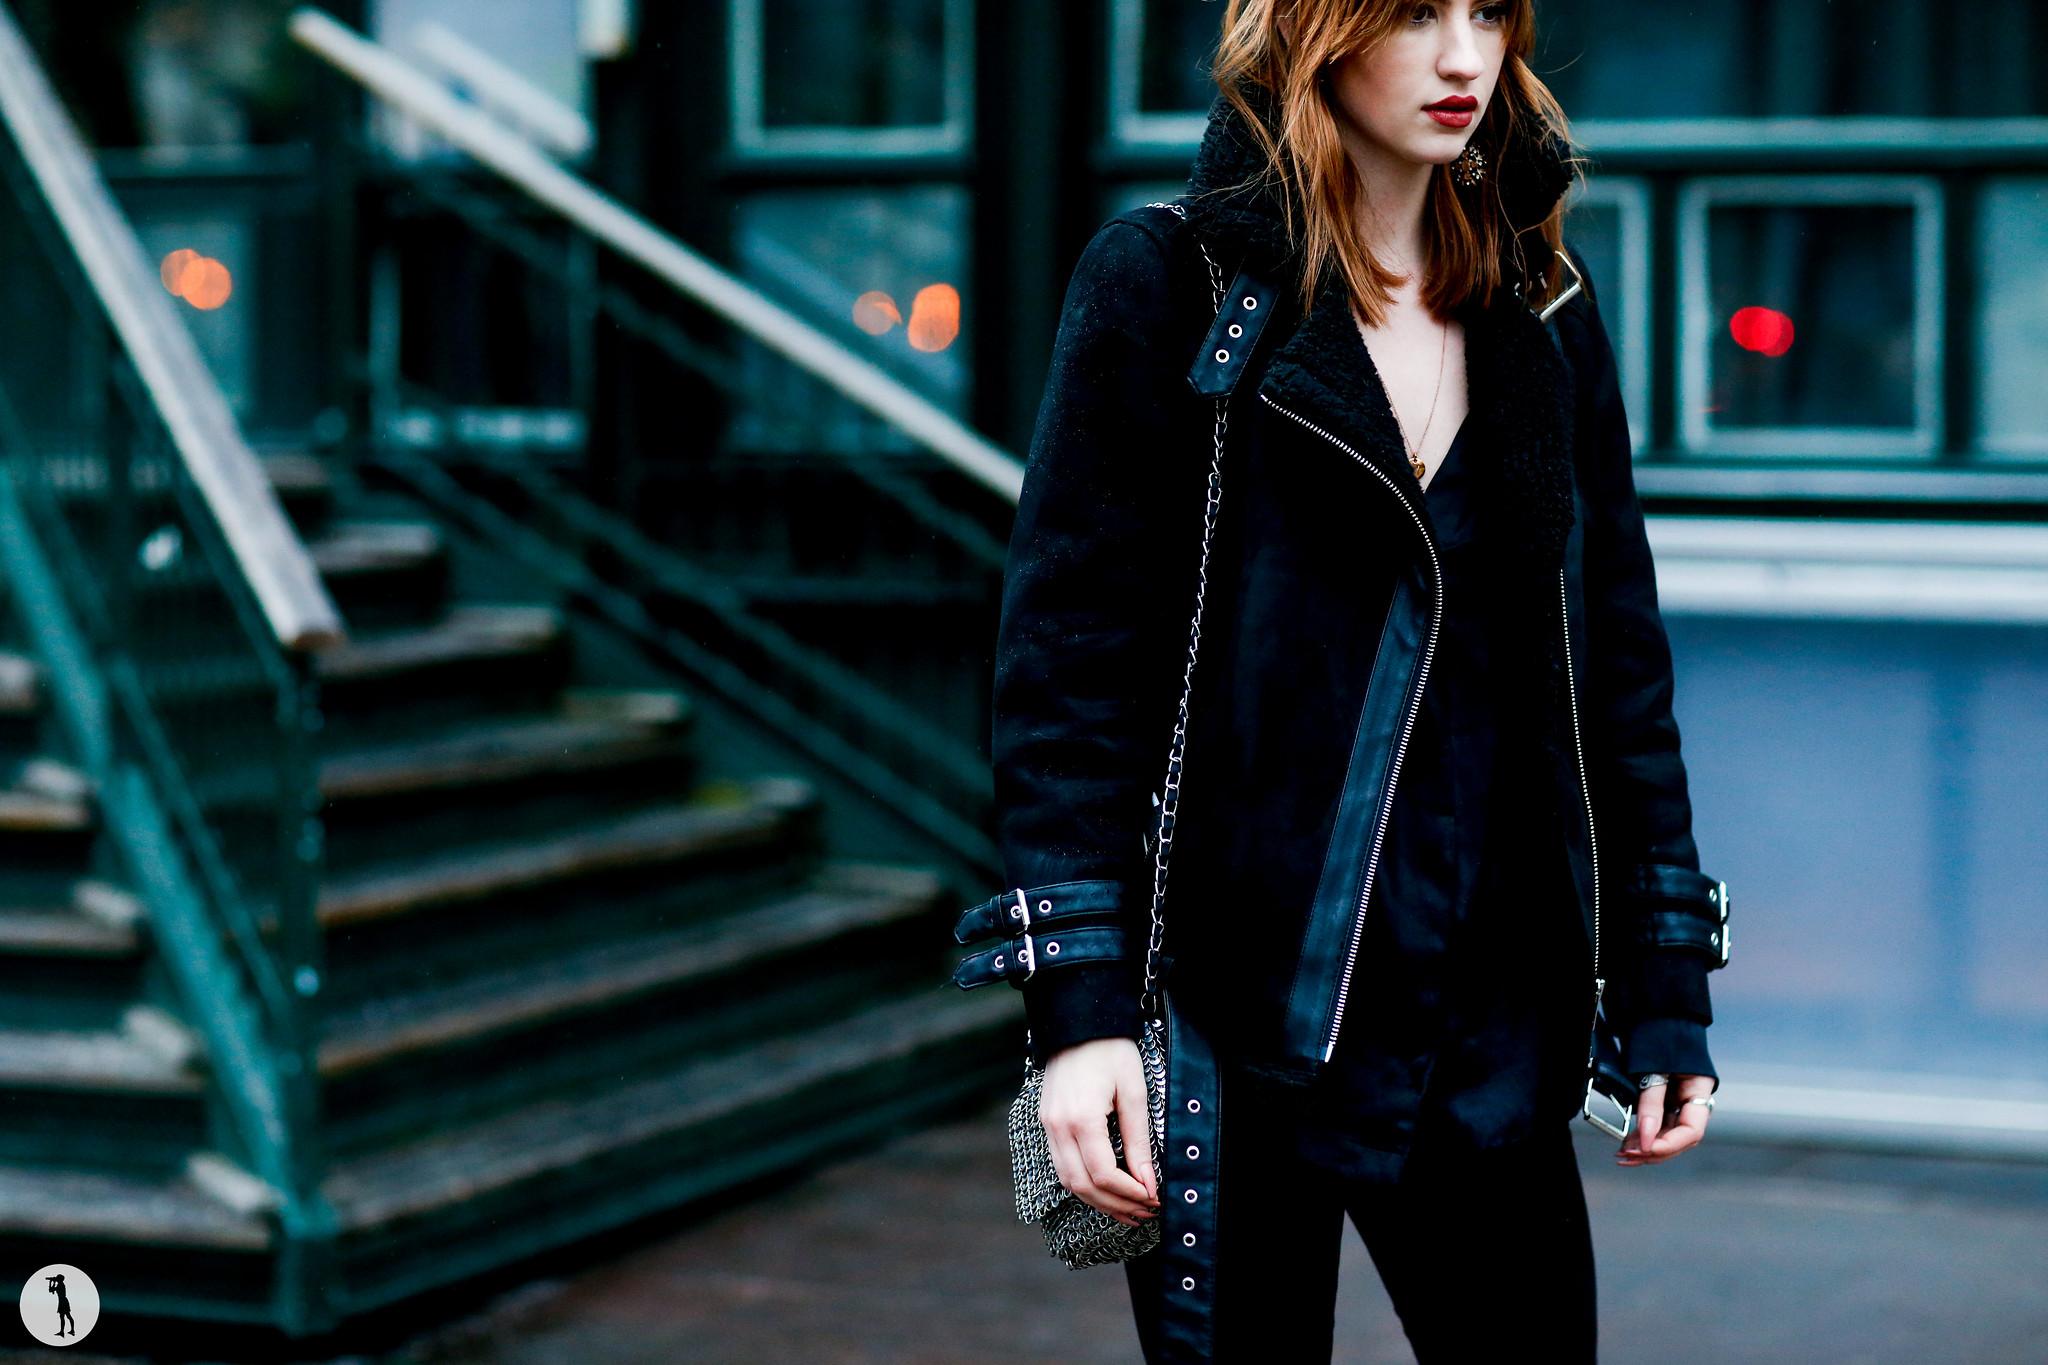 Model Viktoria Moller - Stockholm Fashion Week FW16-17 (1)